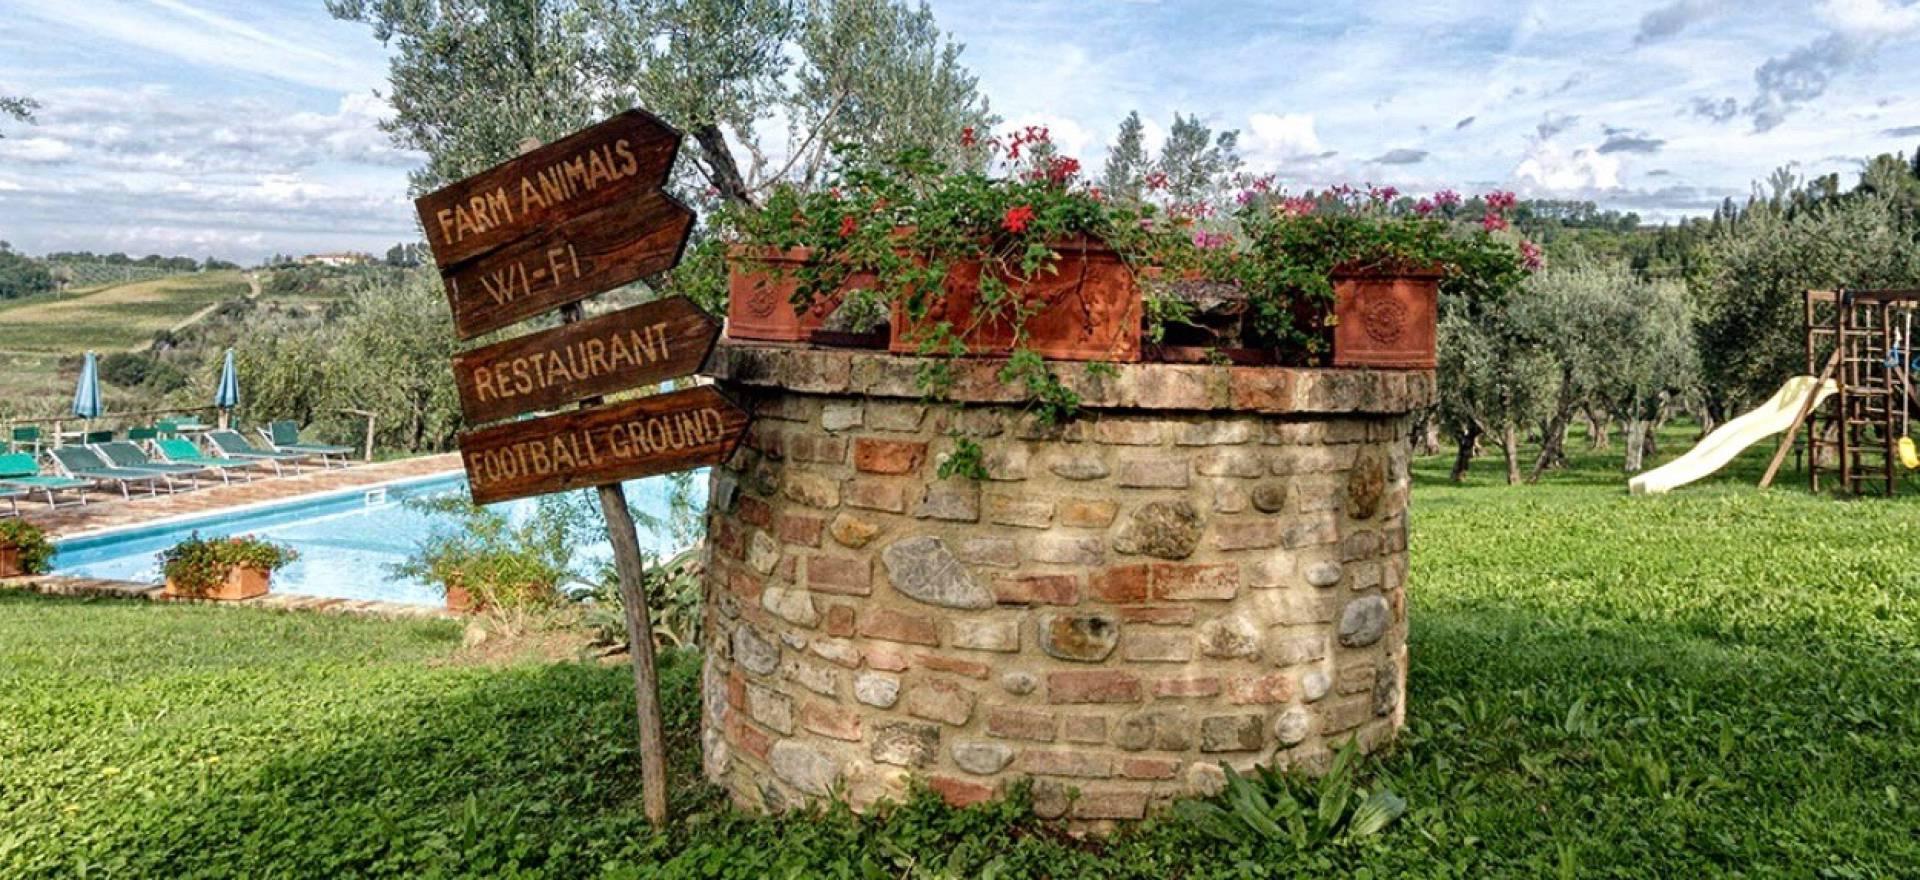 Kindvriendelijke agriturismo in Toscane met restaurant